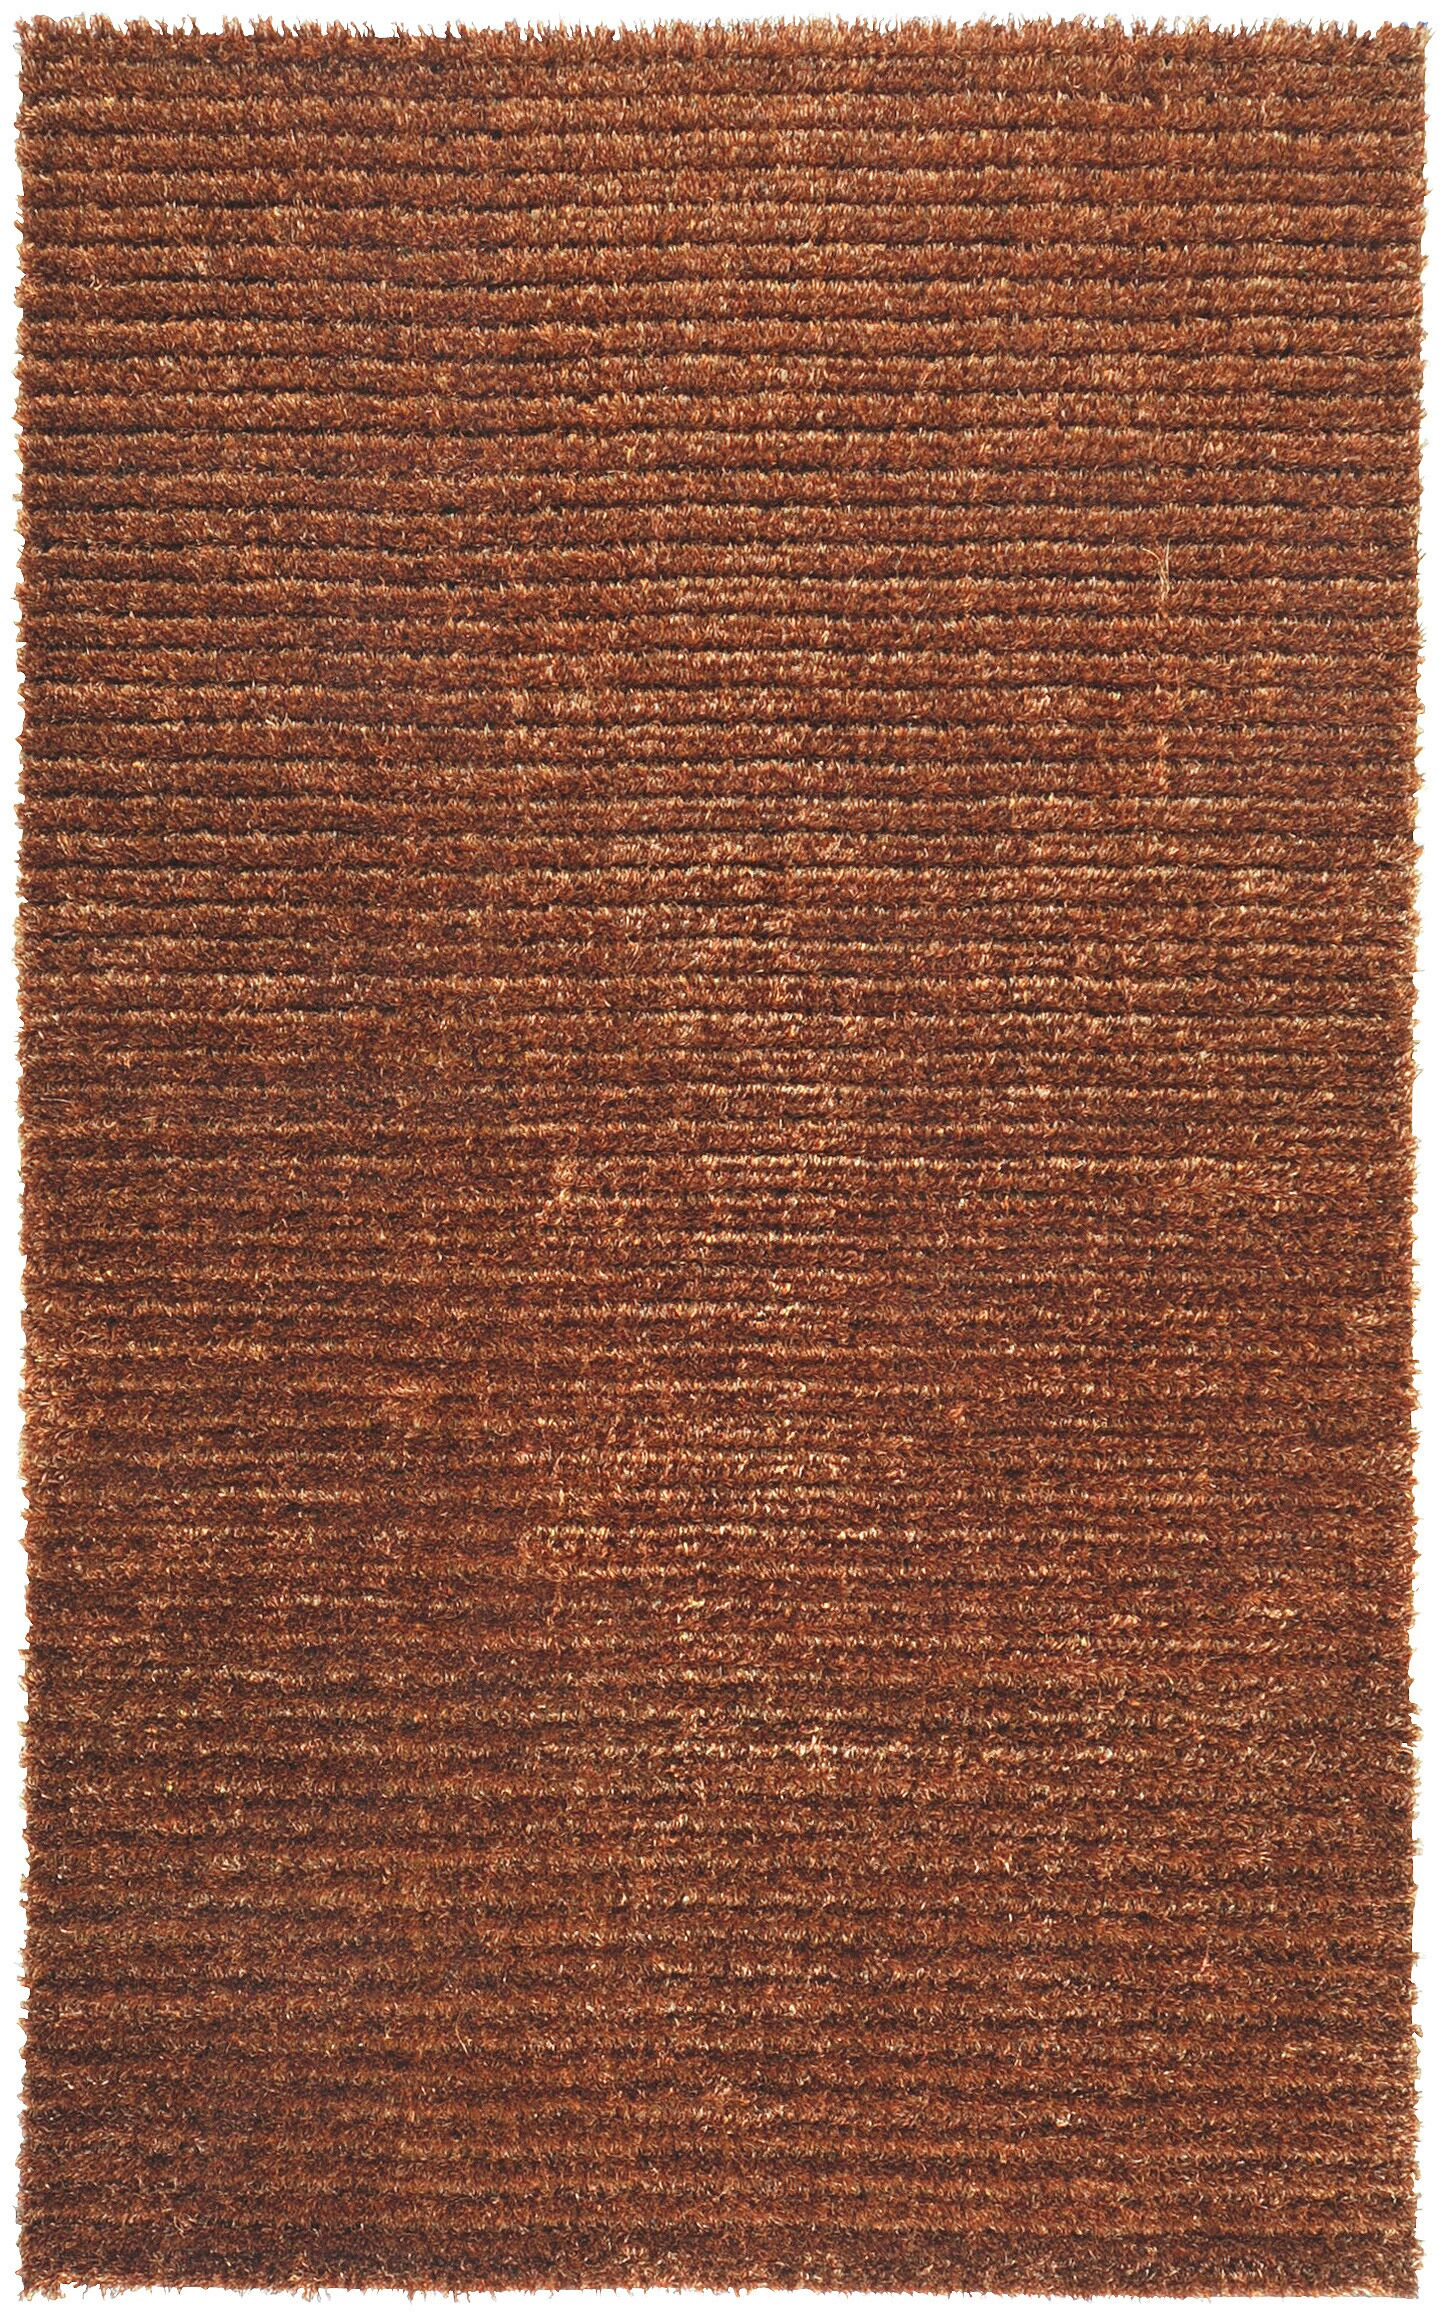 Greenwood Rust Brown/Tan Solid Area Rug Rug Size: Rectangle 5' x 8'